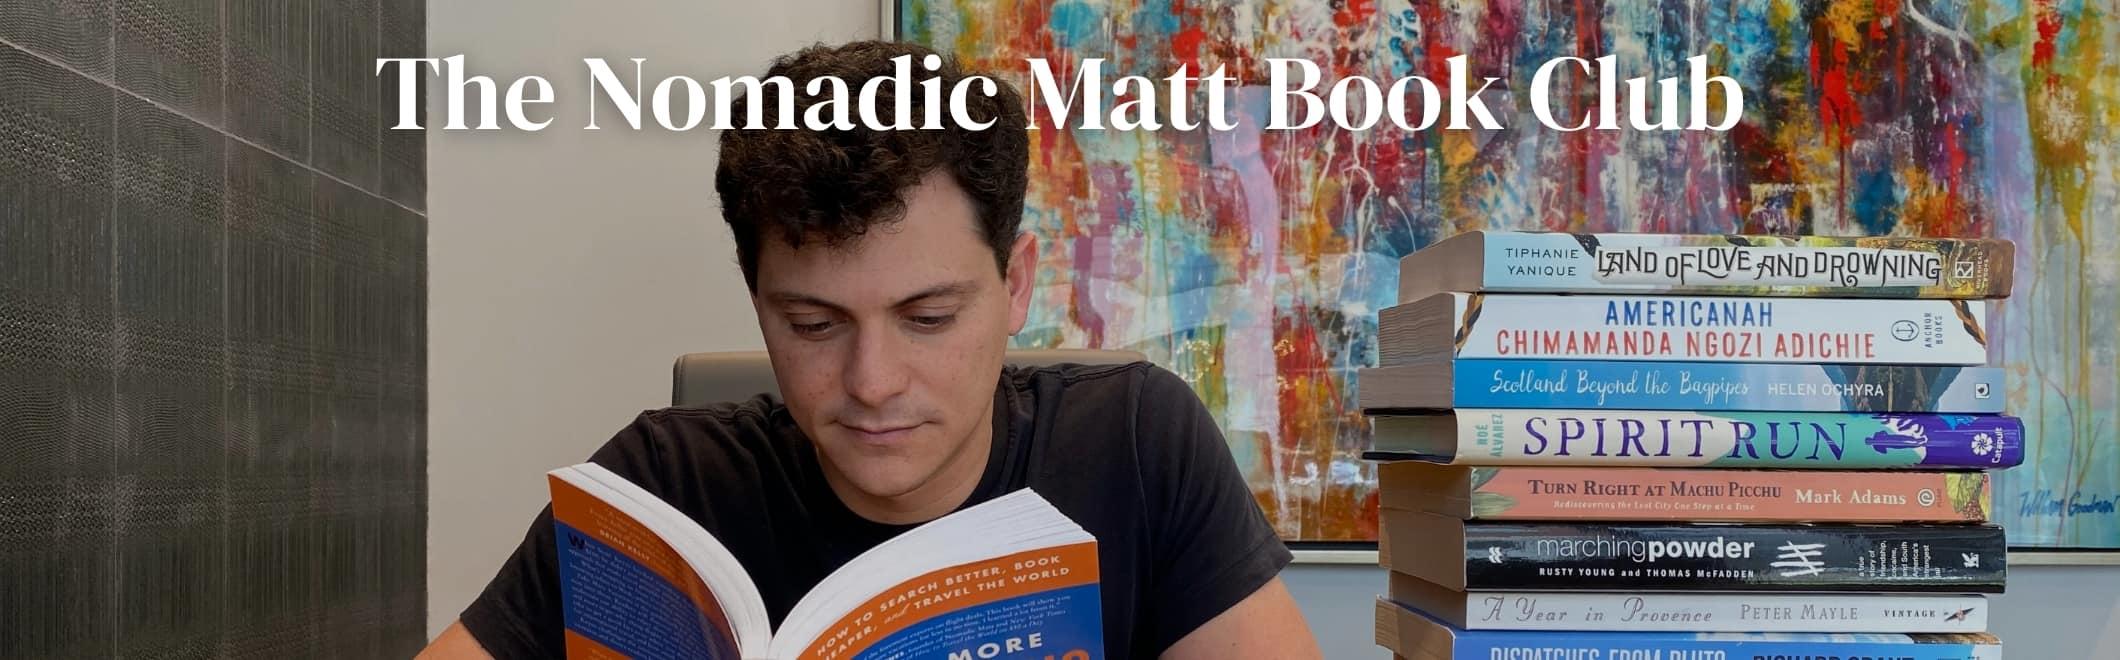 The Nomadic Matt Book Club